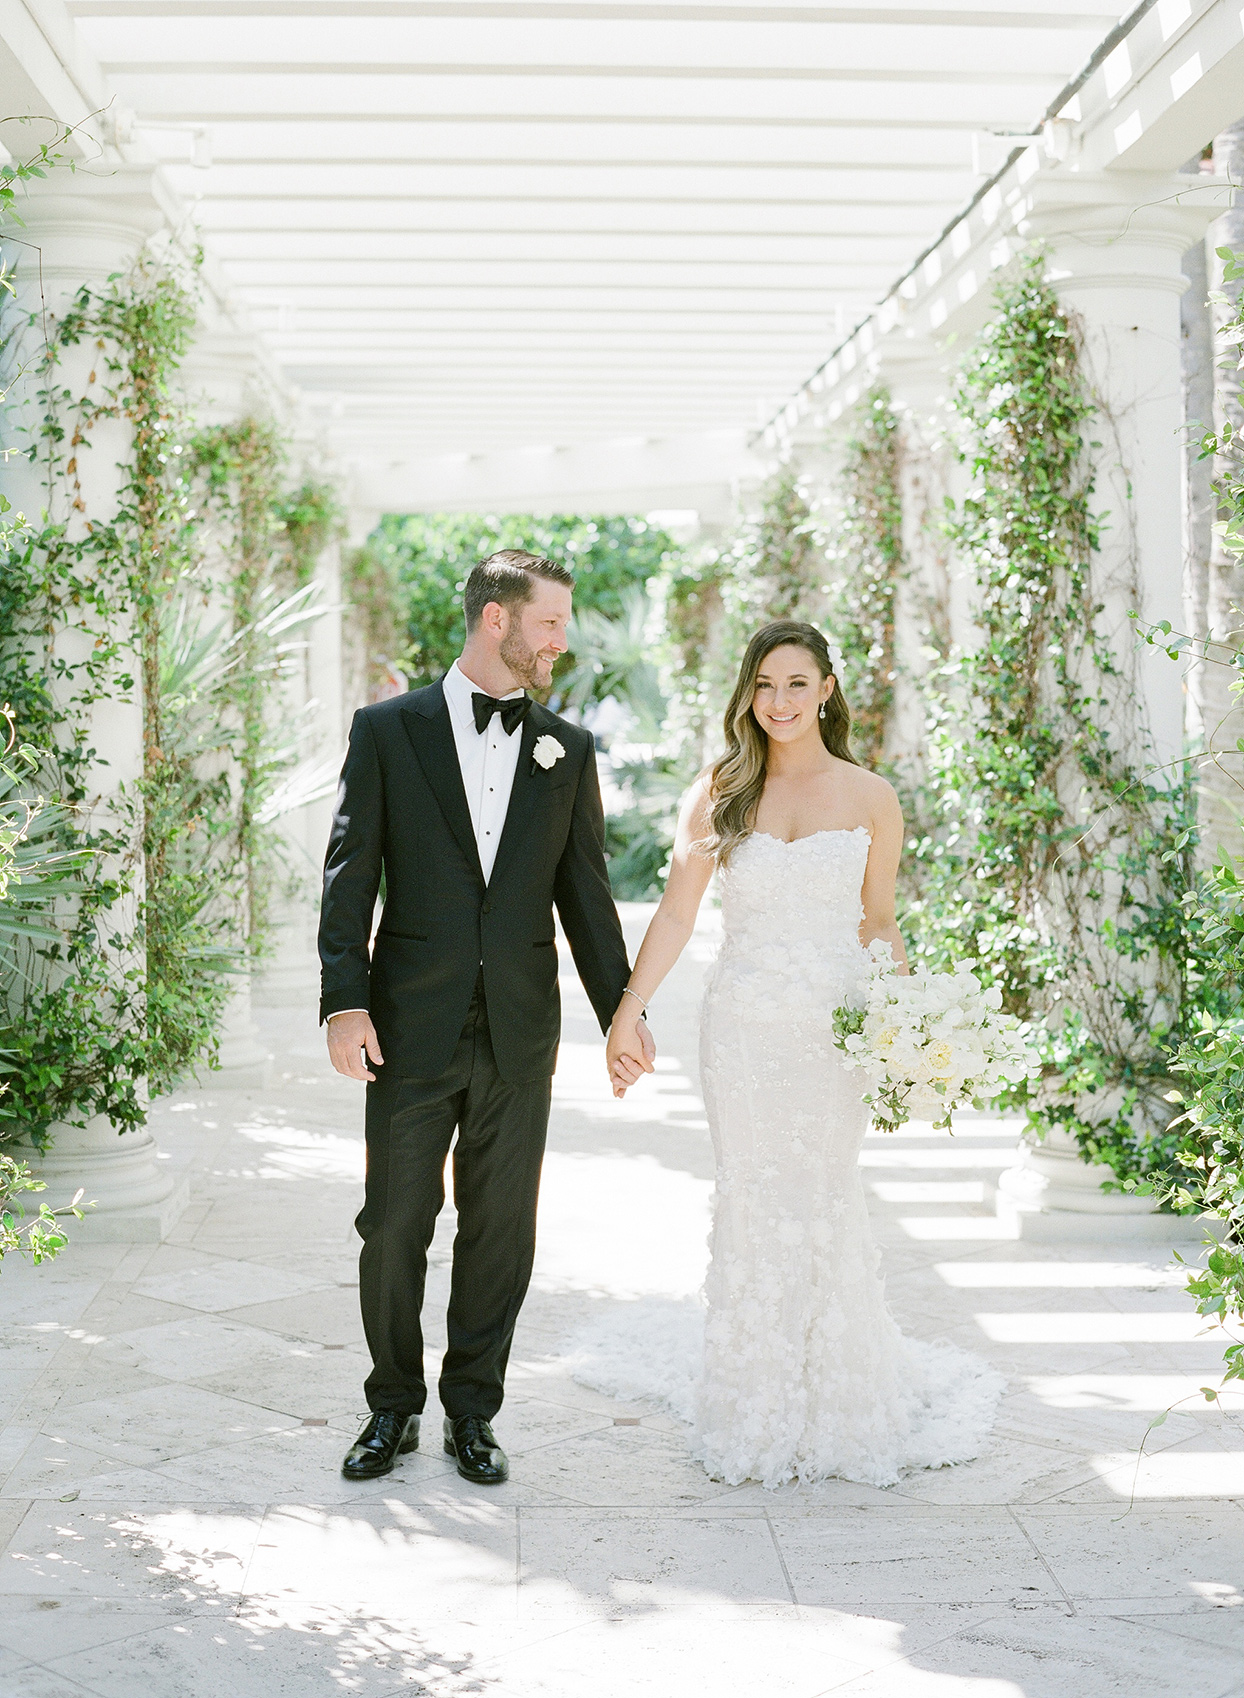 brittany brian wedding couple walking through stone garden structure